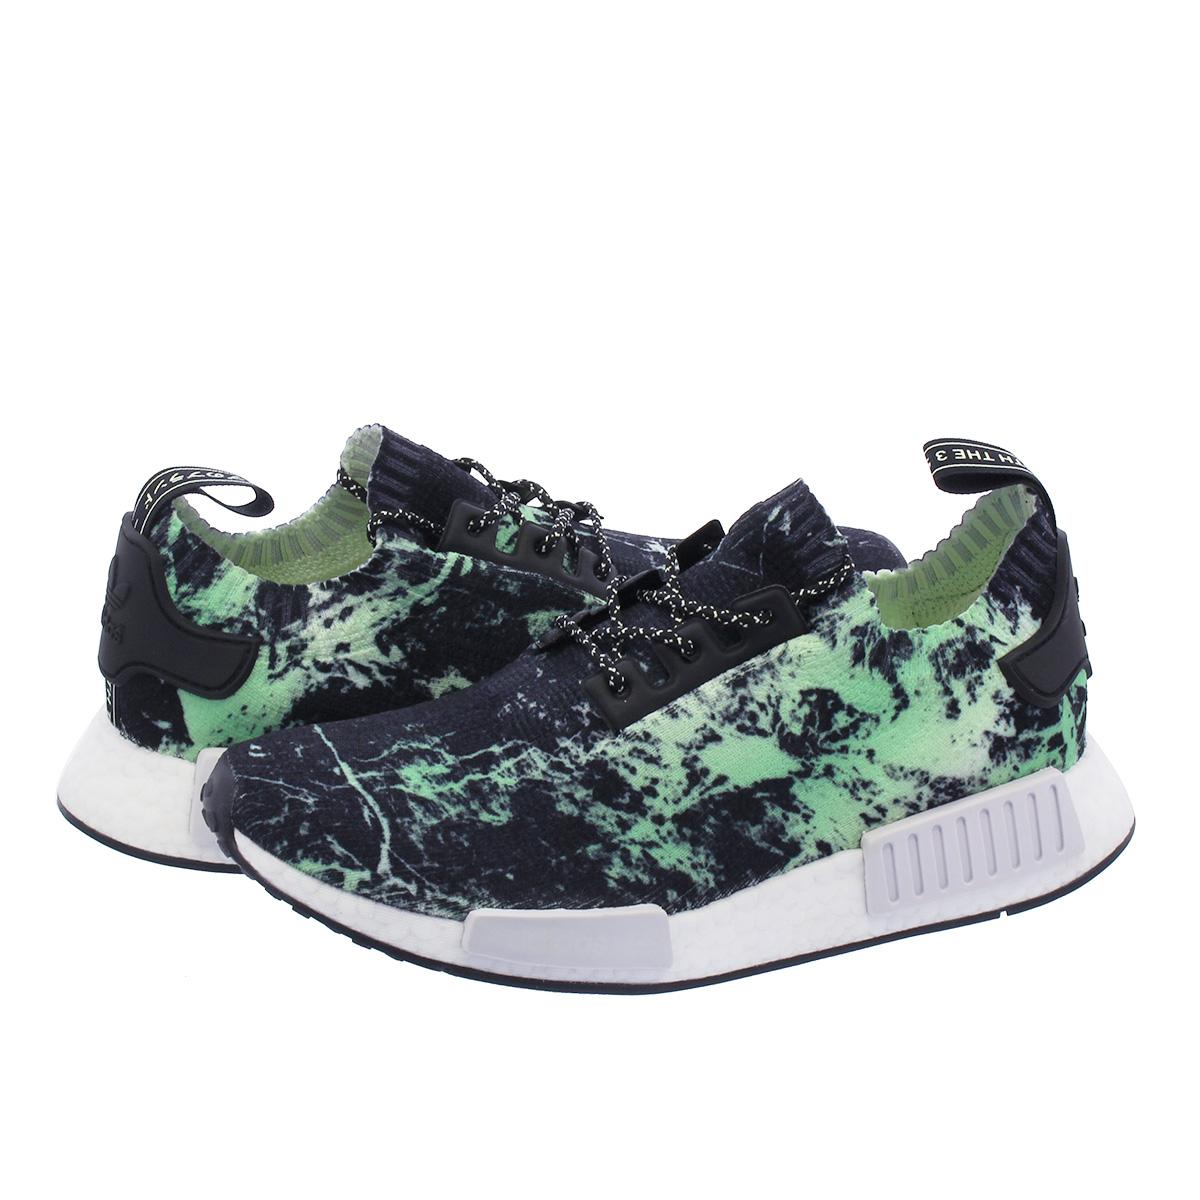 info for 44eb6 f0a29 adidas NMD R1 PK Adidas nomad R1 PK BLACK/WHITE/GREEN bb7996